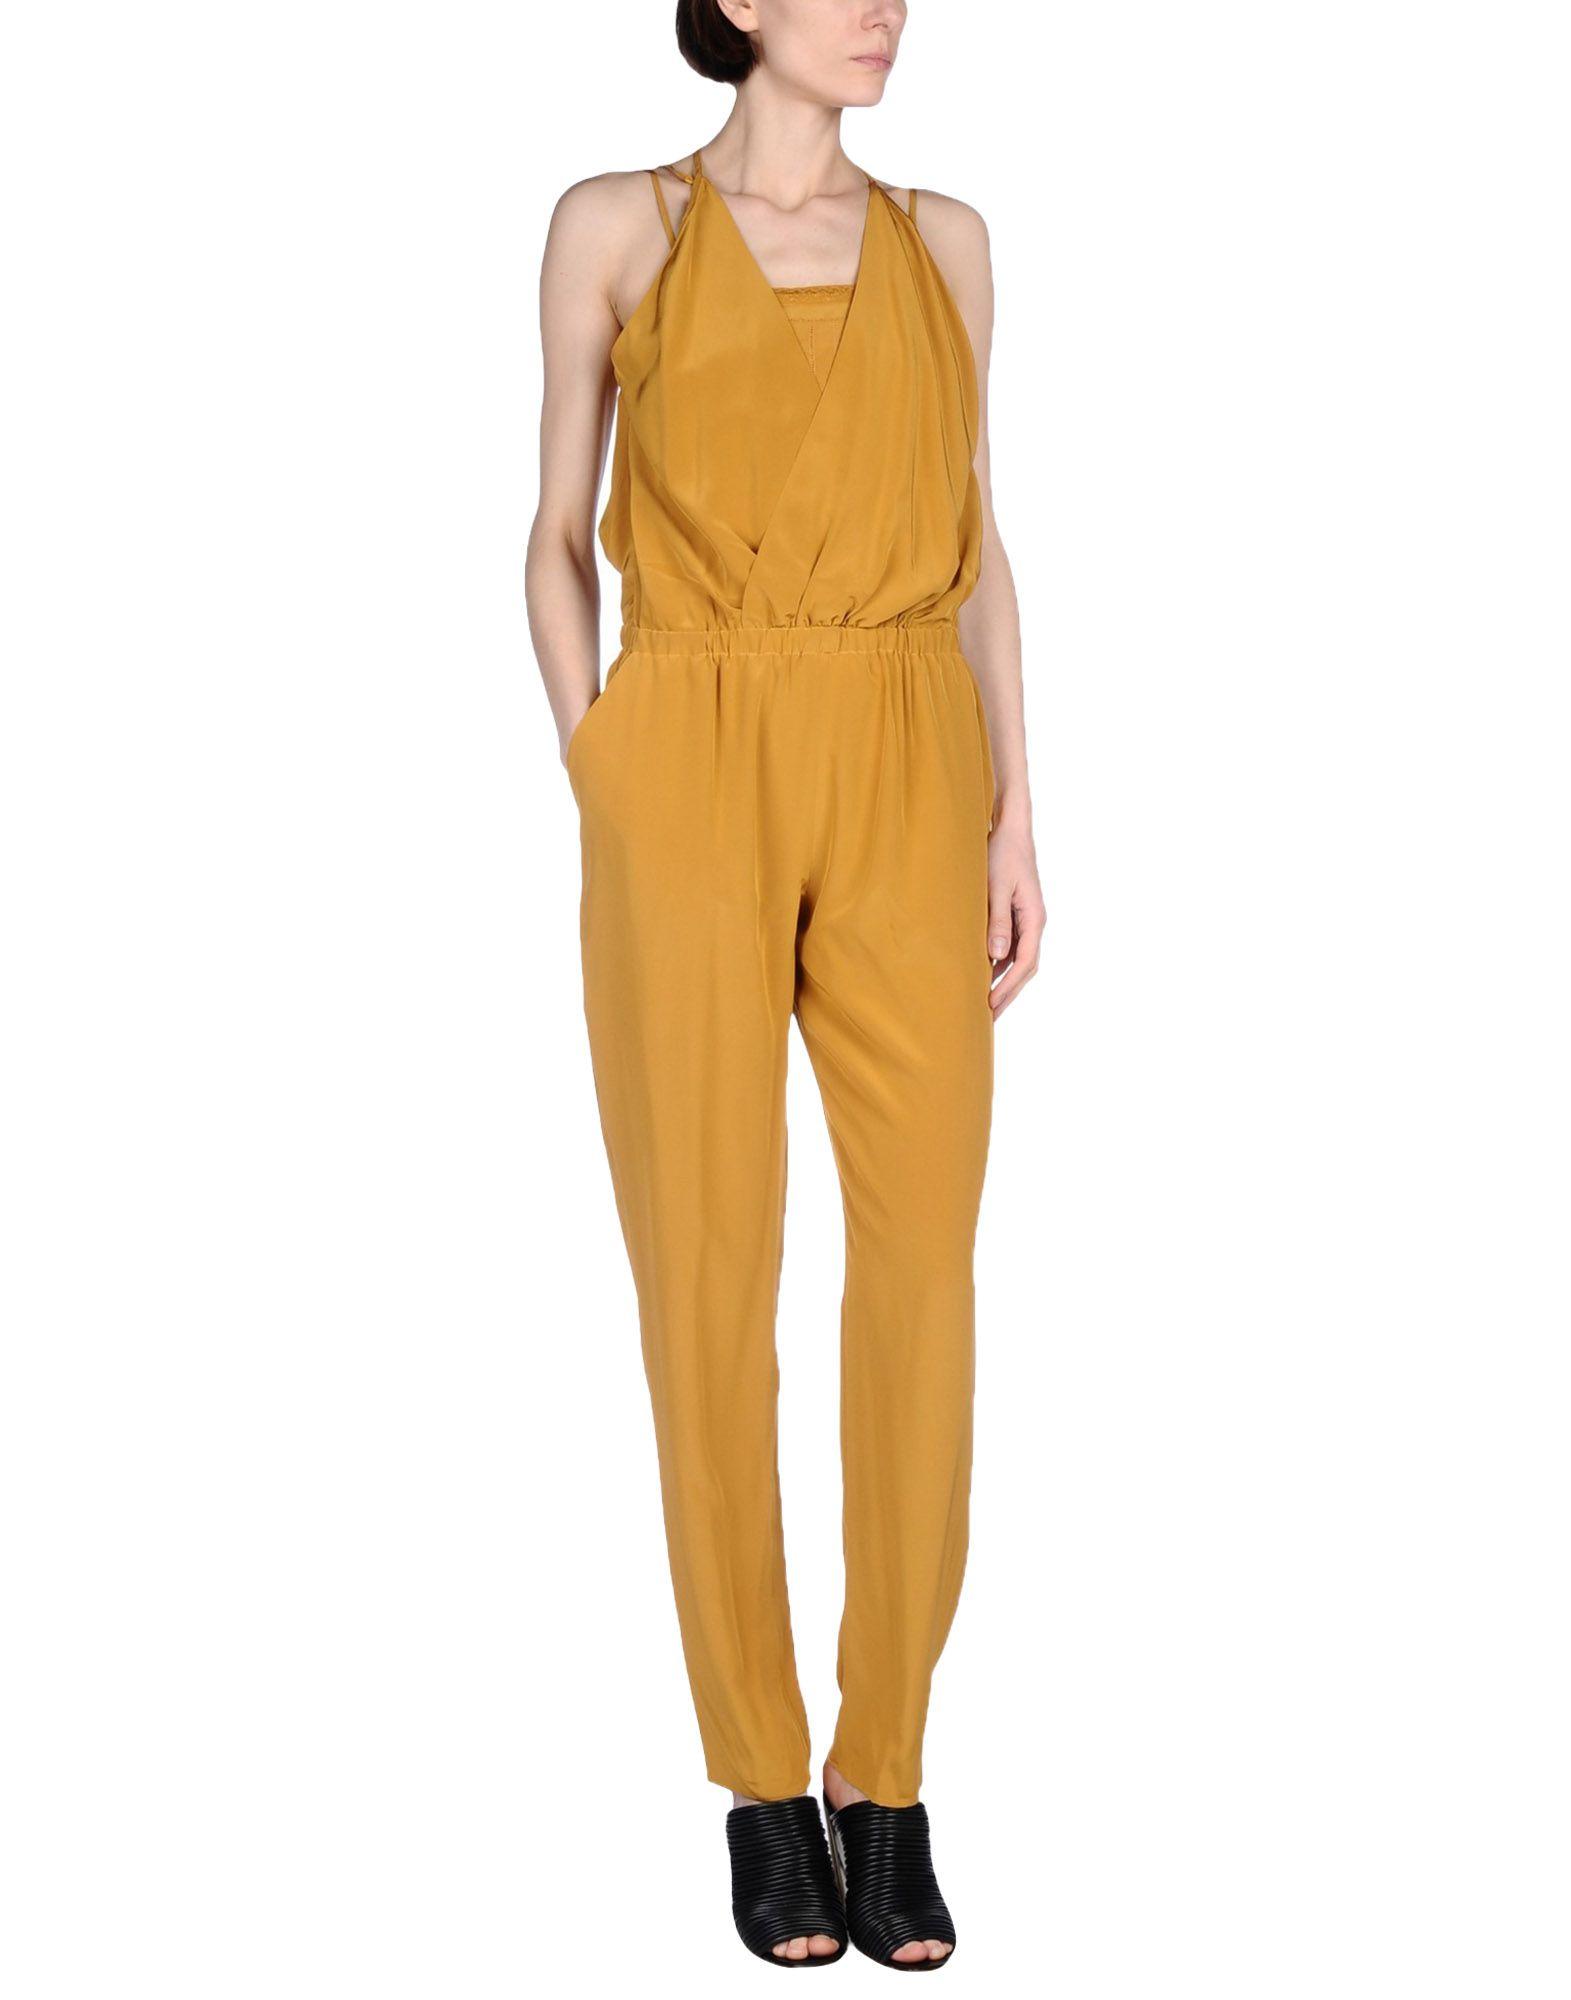 vanessa bruno female vanessa bruno jumpsuits